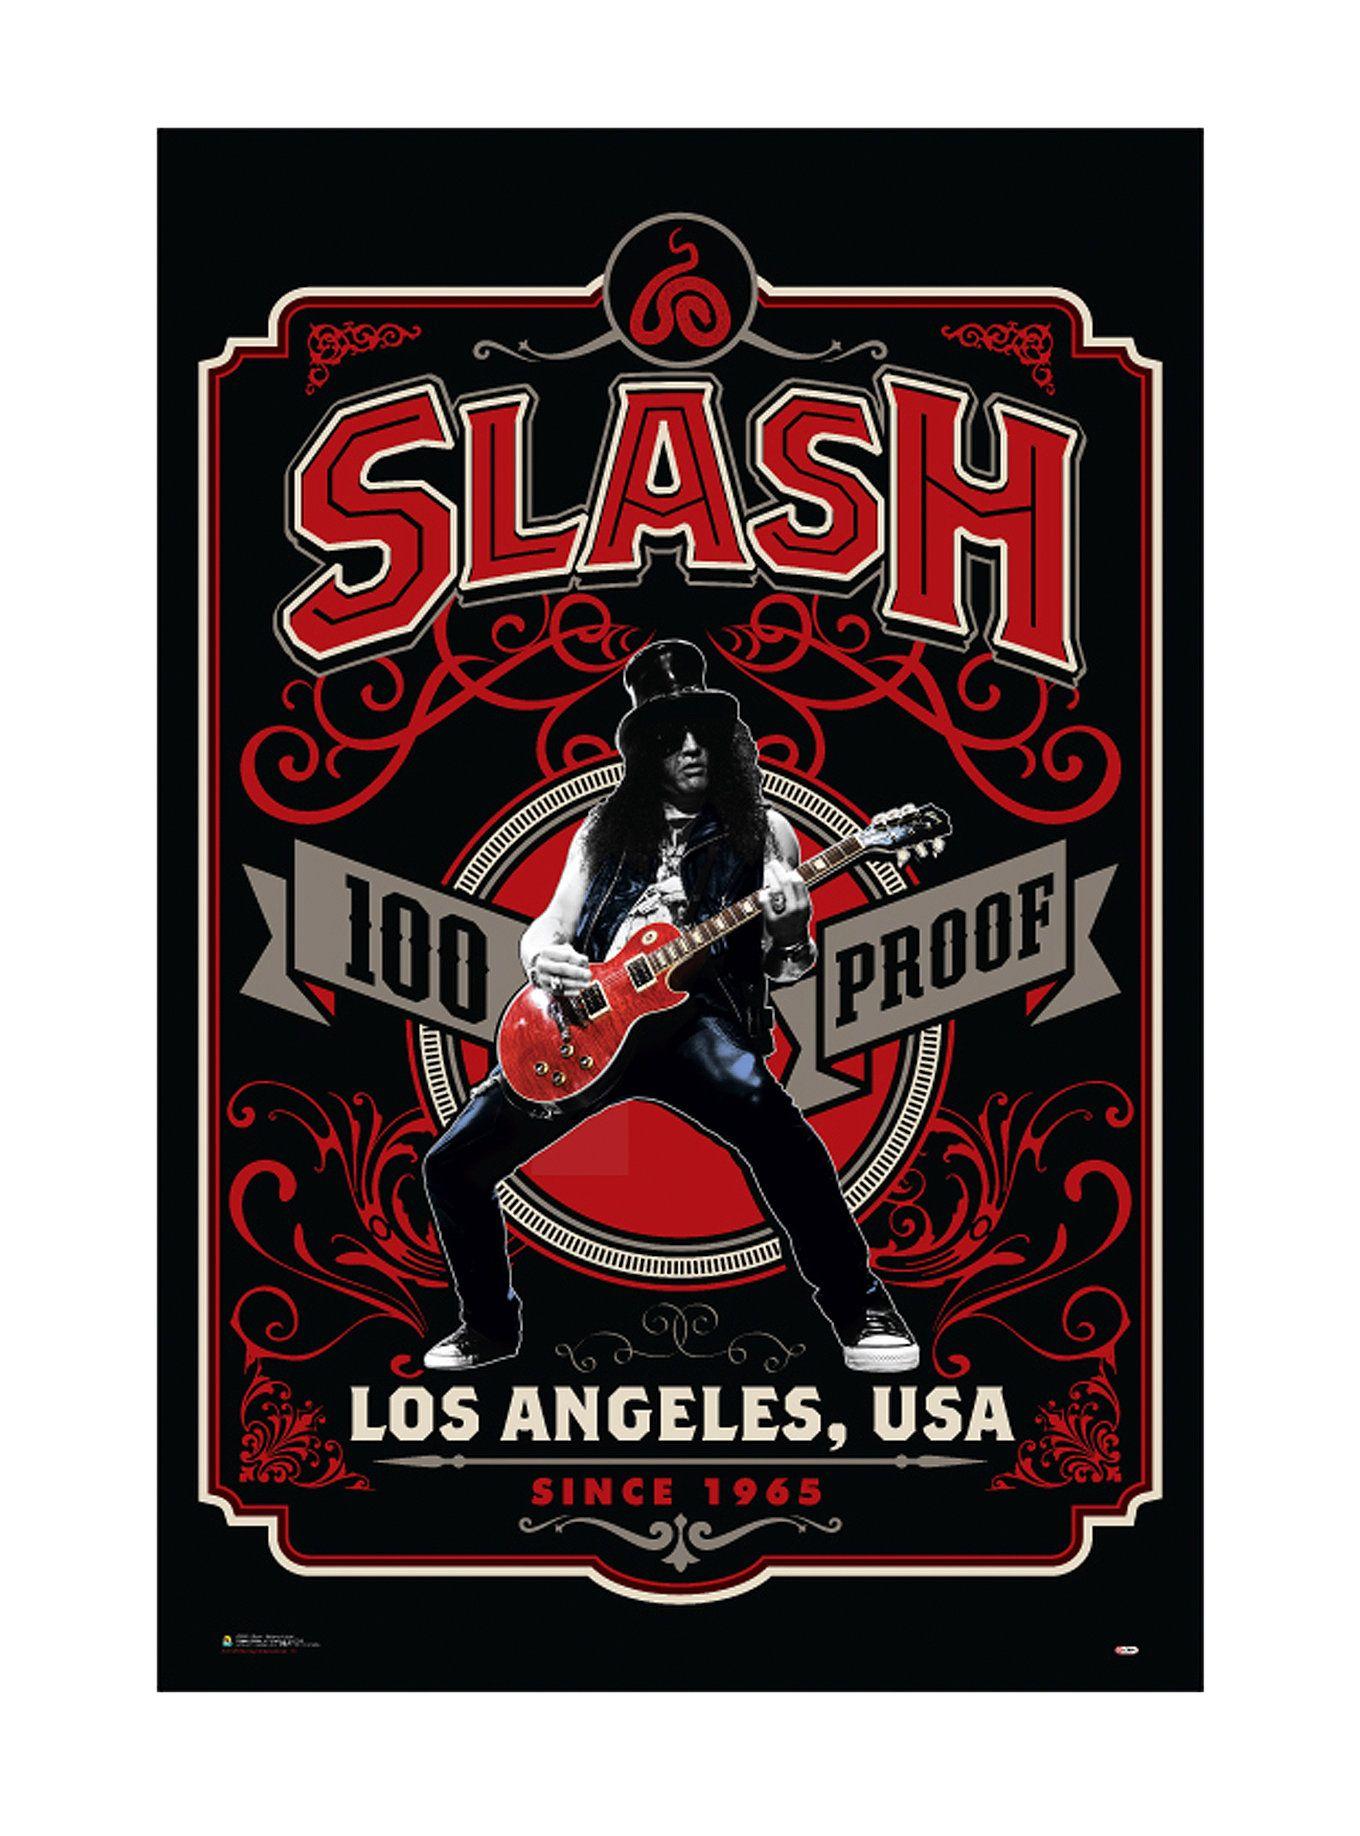 Guns n roses critical solution - Buy Art For Less Guns N Roses Slash Whiskey Label 100 Proof Los Angeles Framed Graphic Art You Ll Love